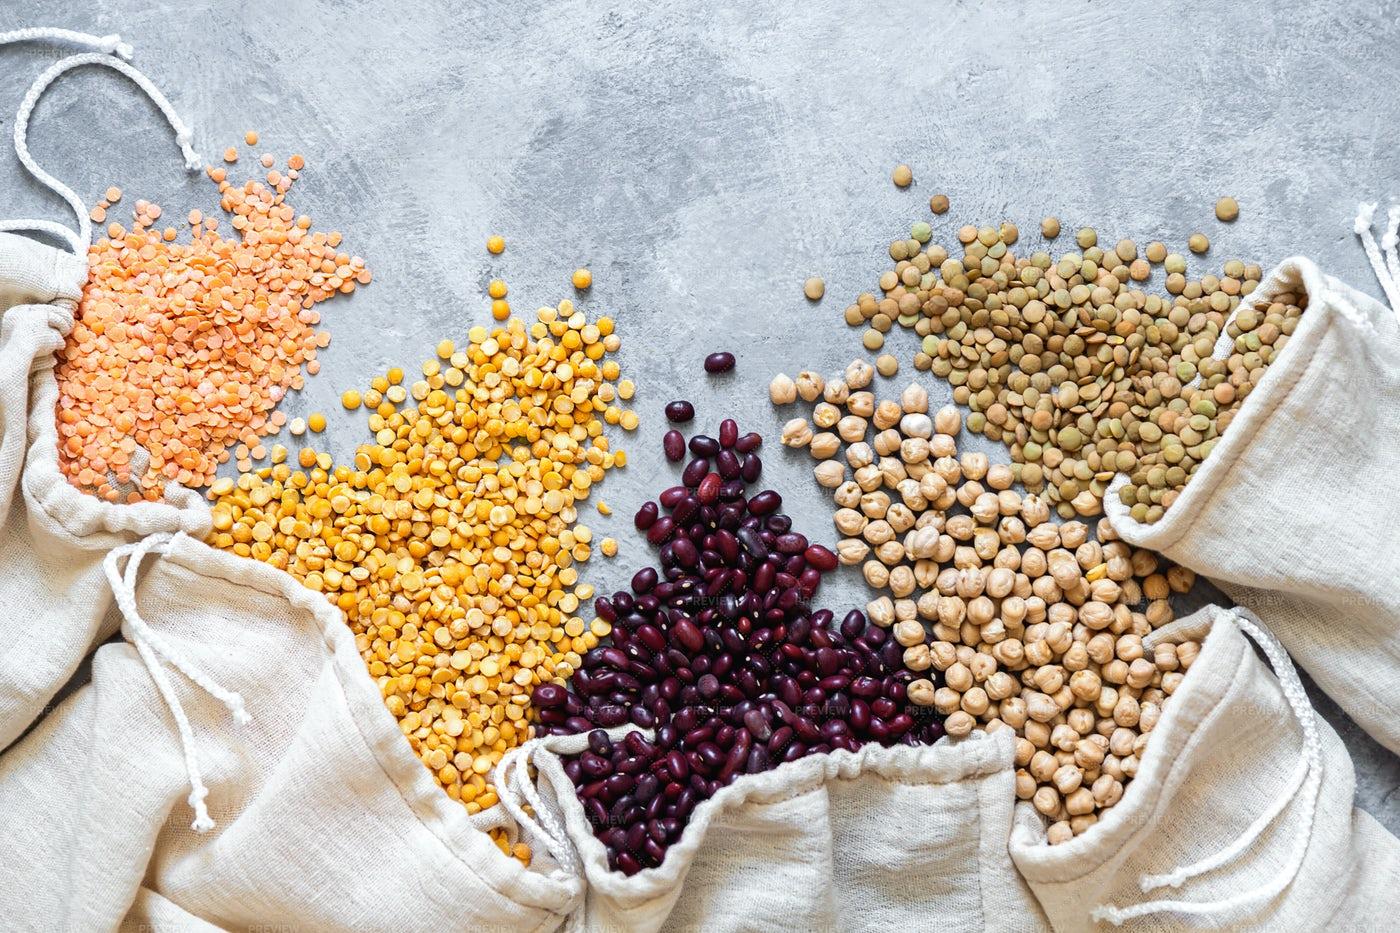 Sacks Of Different Beans: Stock Photos